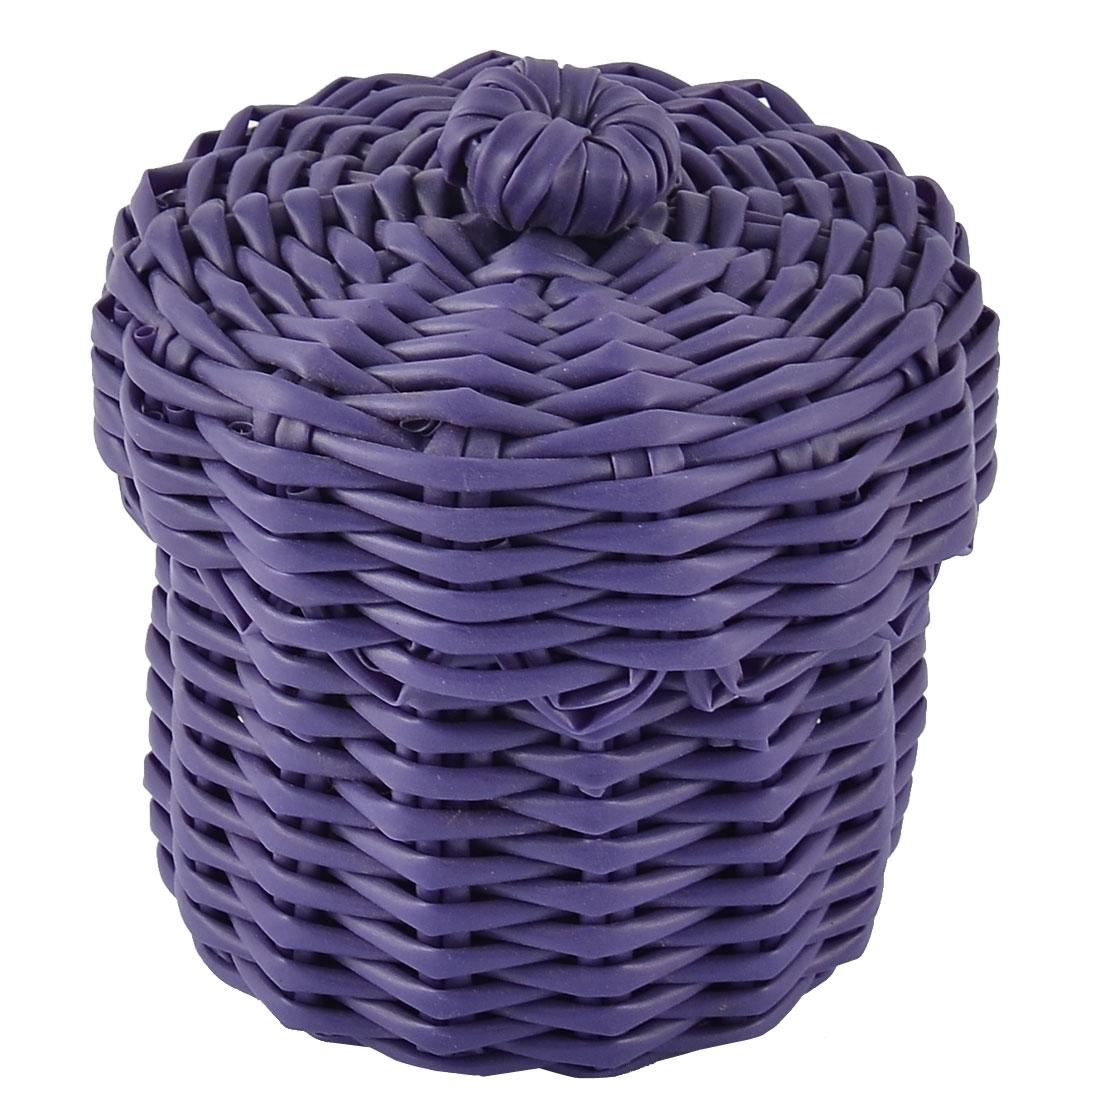 Home Office Plastic Knit Gathering Settle Storage Box Case Basket w Lid Purple